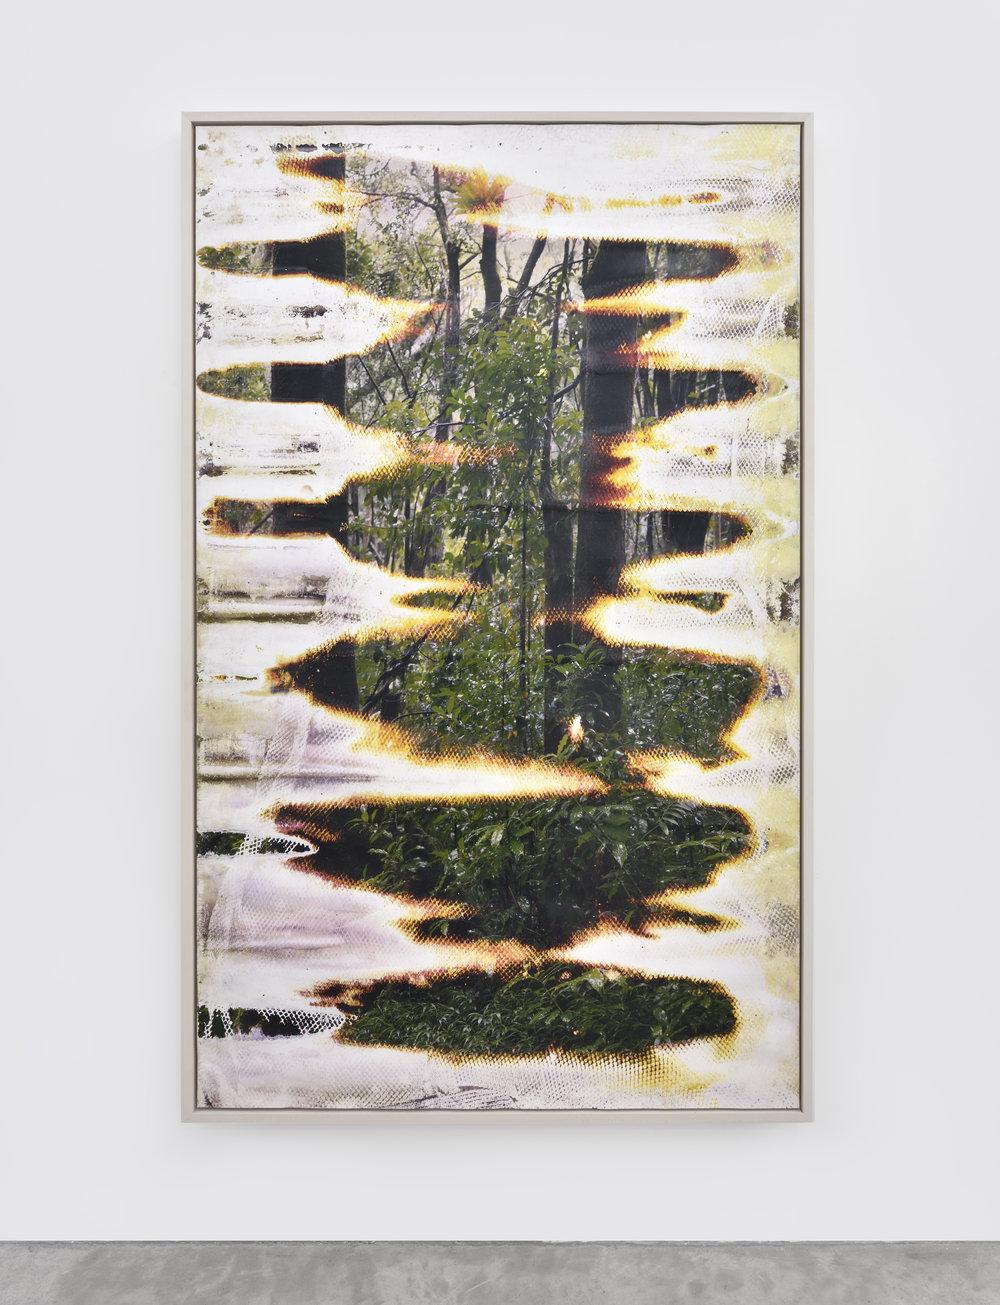 Matthew Brandt, Wai'anae 92150X, 2015 c-print buried in Wai'anae, Hawai'i 207,6 x 127 cm - 81 3/4 x 50 inches